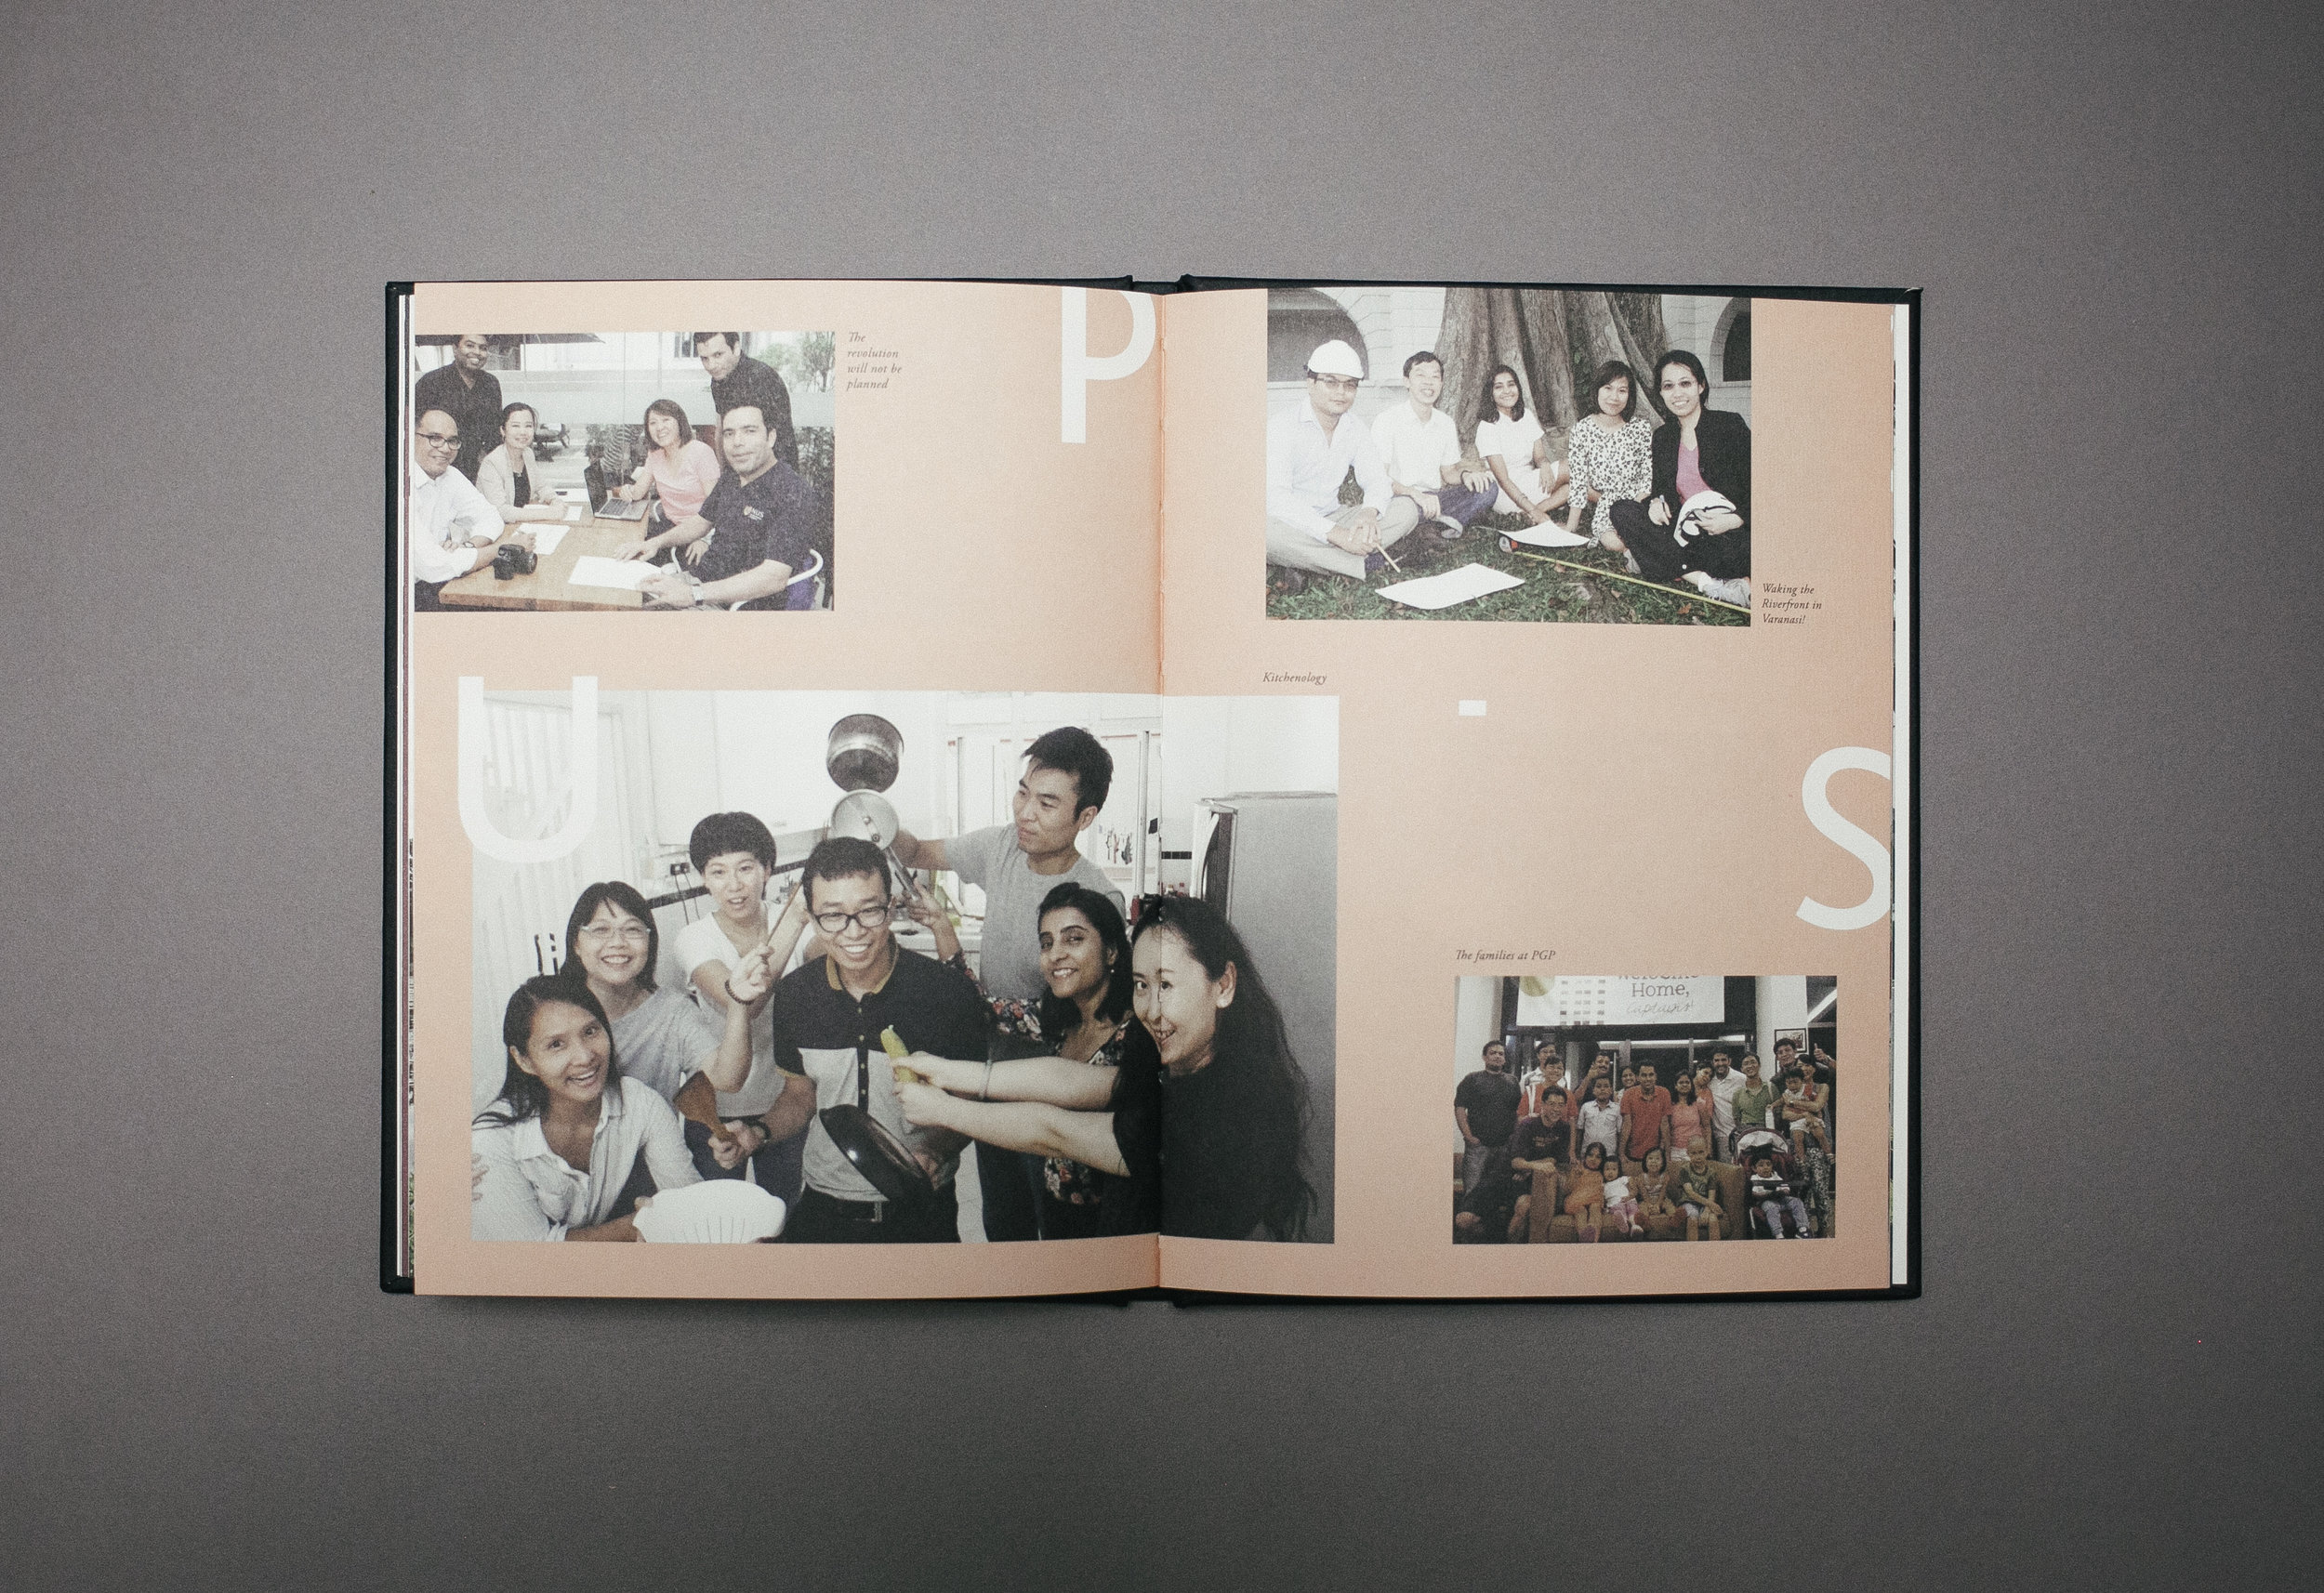 lee kuan yew school of public policy yearbook 8.jpg